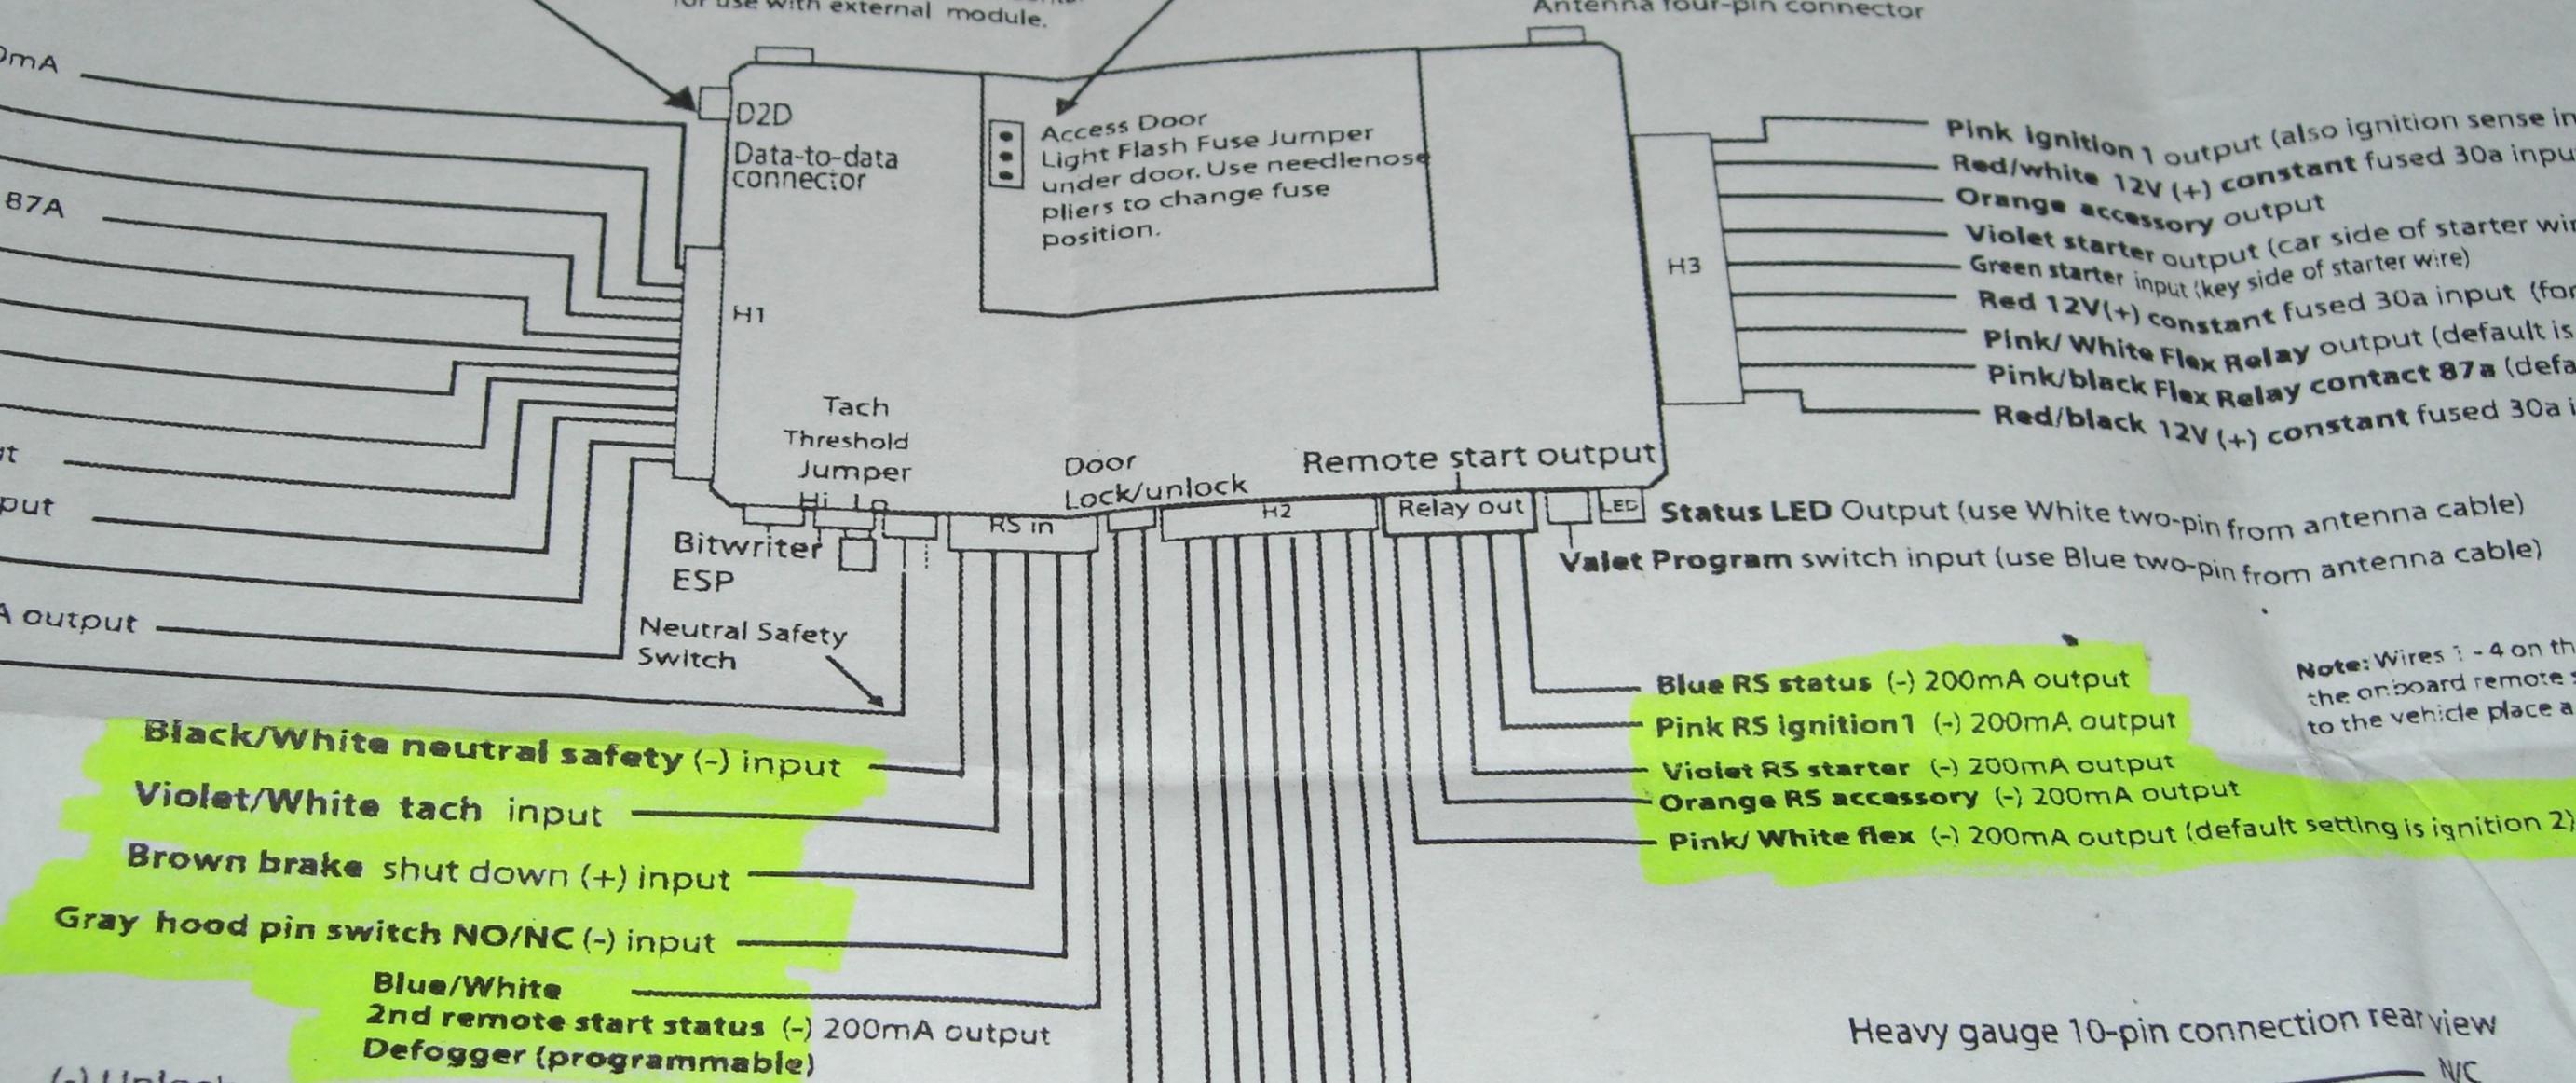 Fantastic 5901 Viper Alarm Wiring Diagram Pictures - Wiring Diagram ...